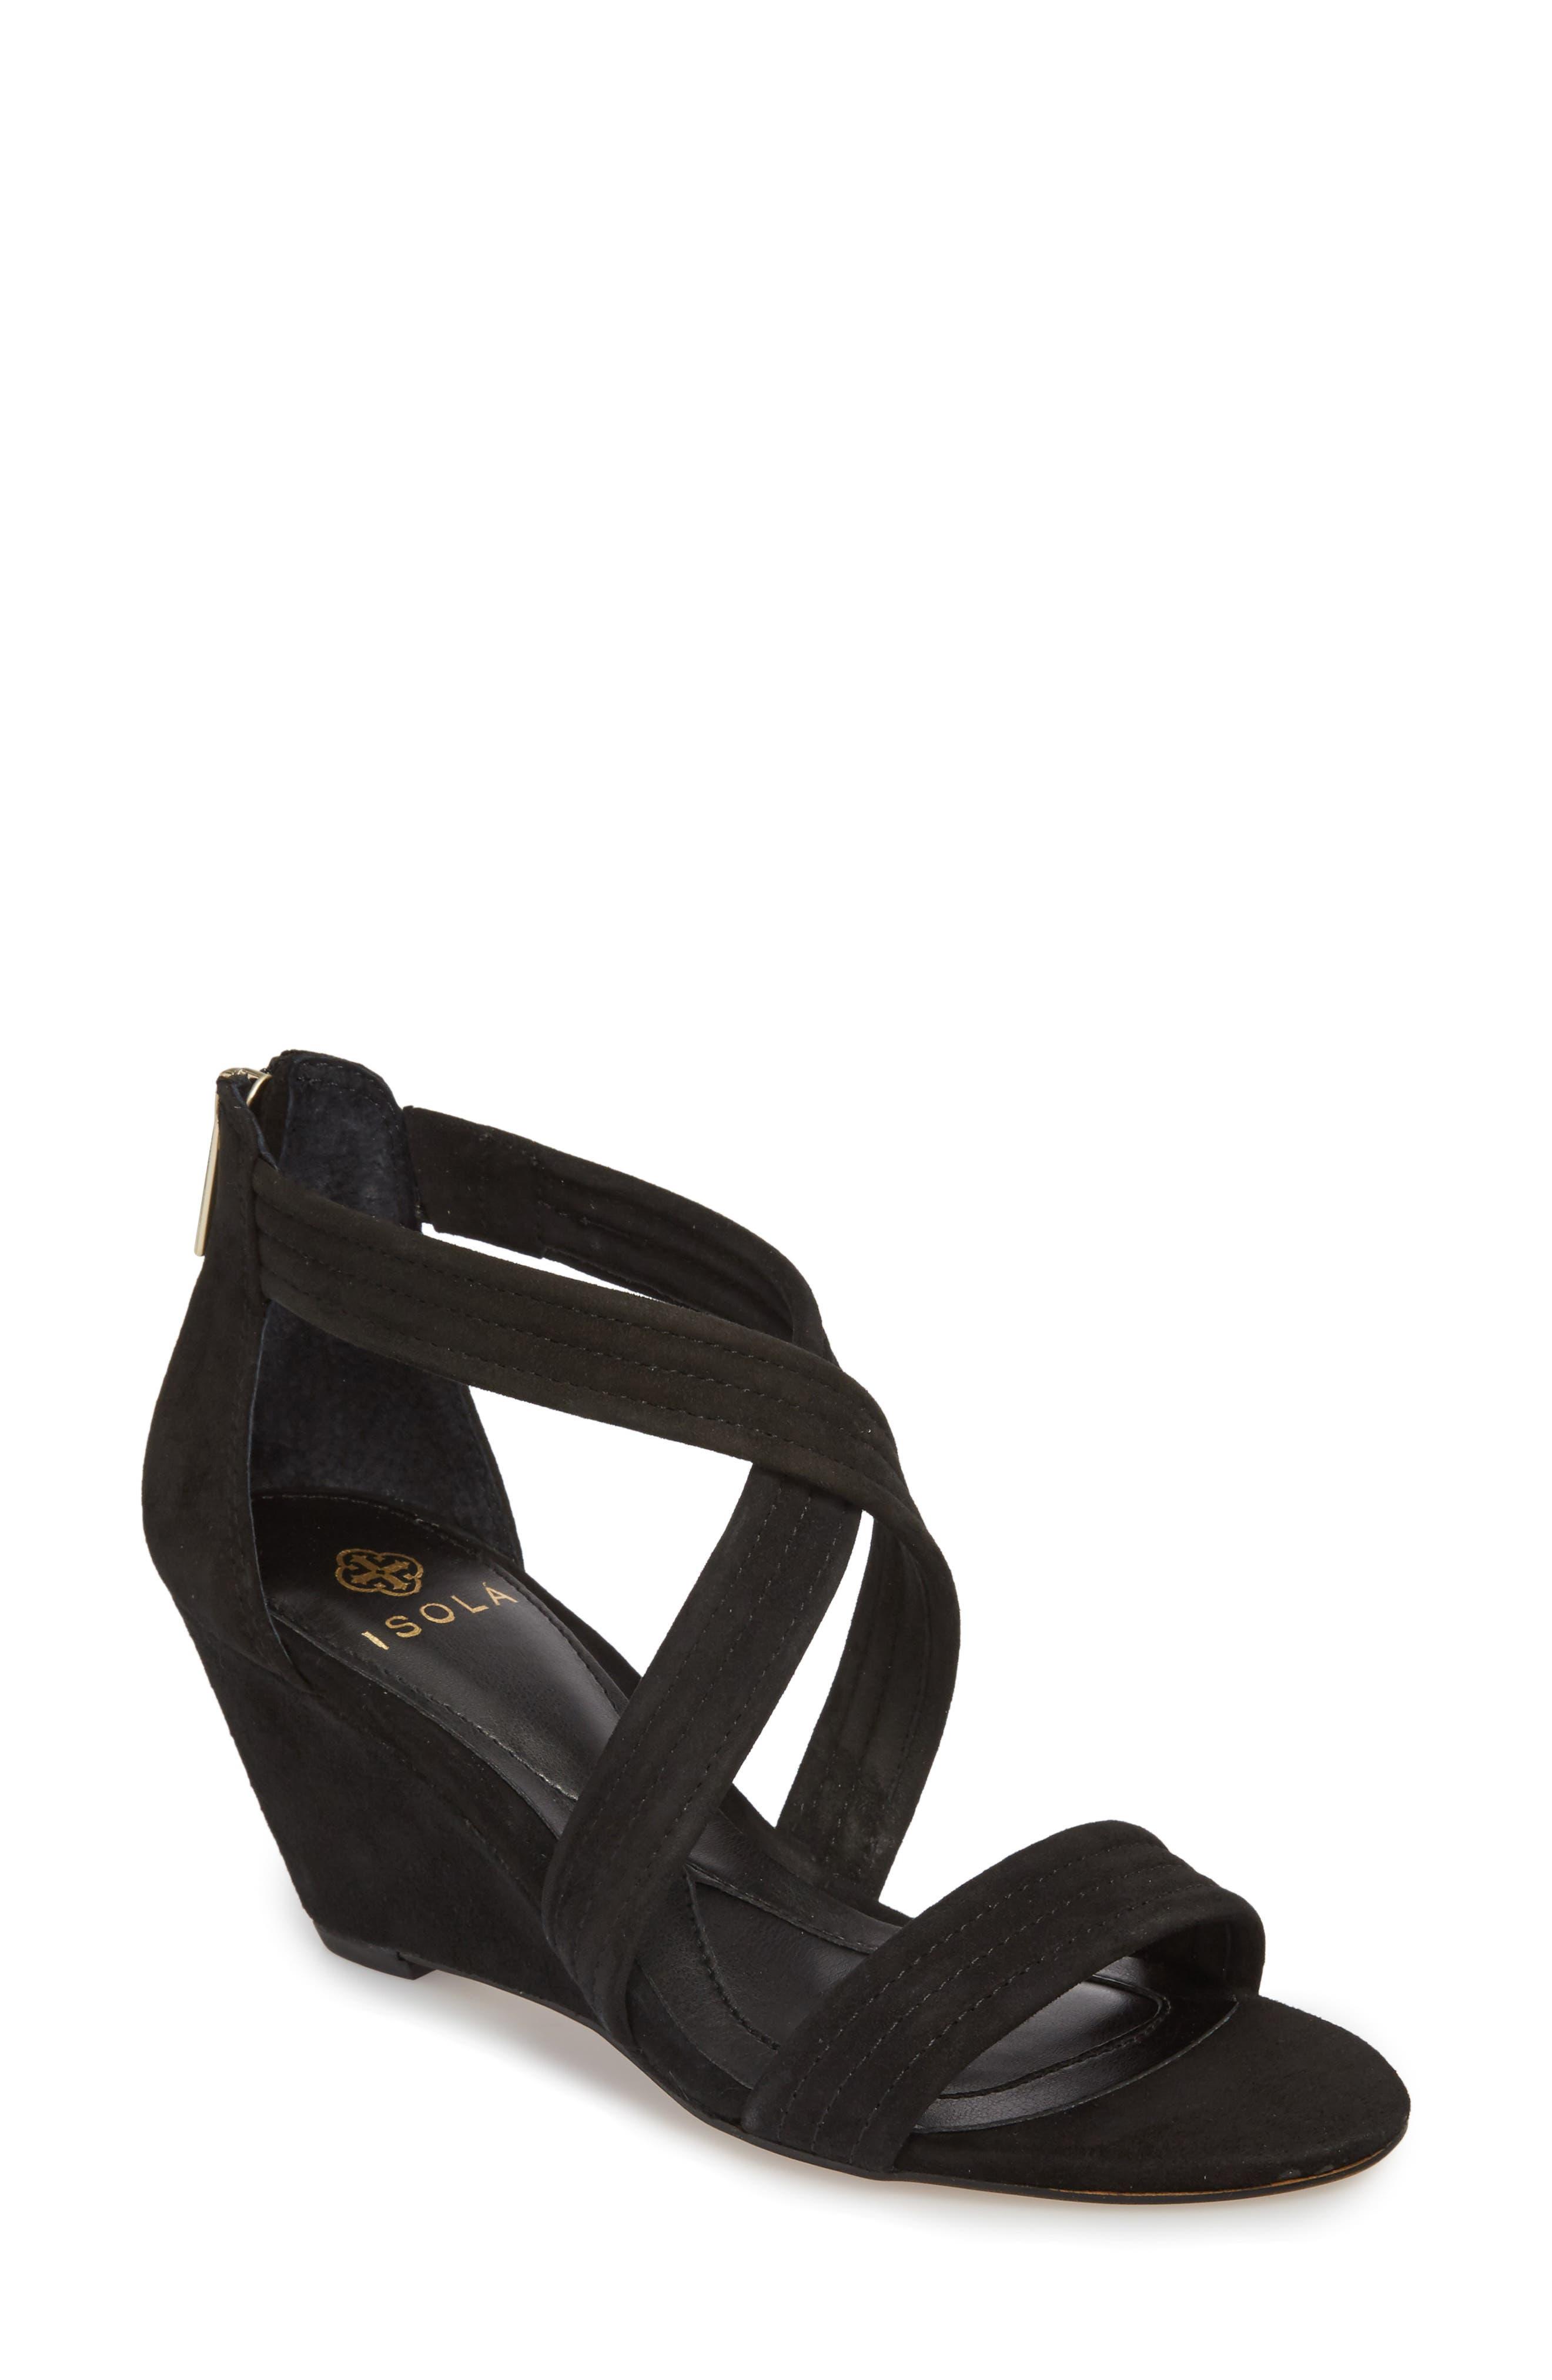 Fia Wedge Sandal,                         Main,                         color, BLACK SUEDE